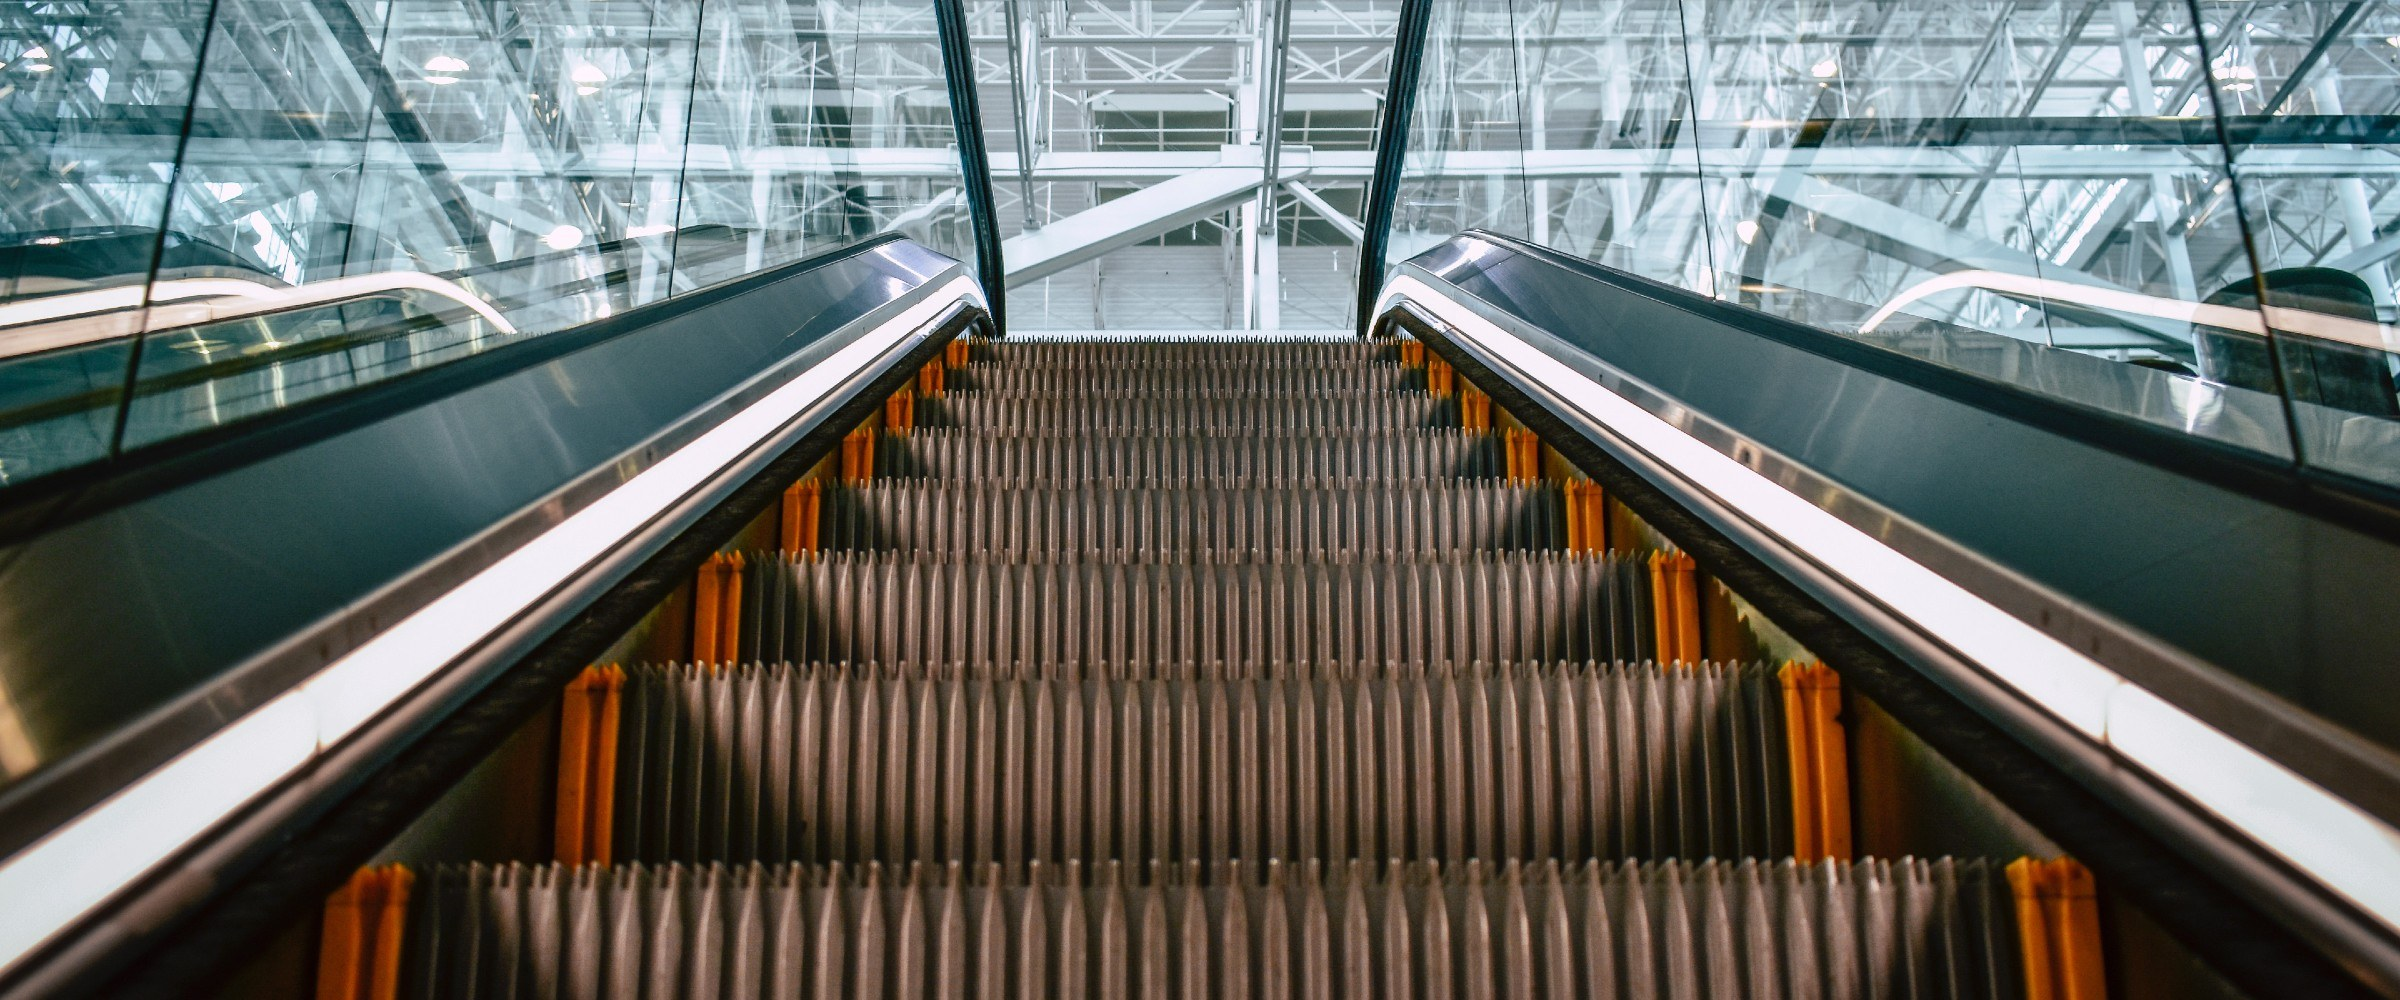 escalator image to represent escalation clause